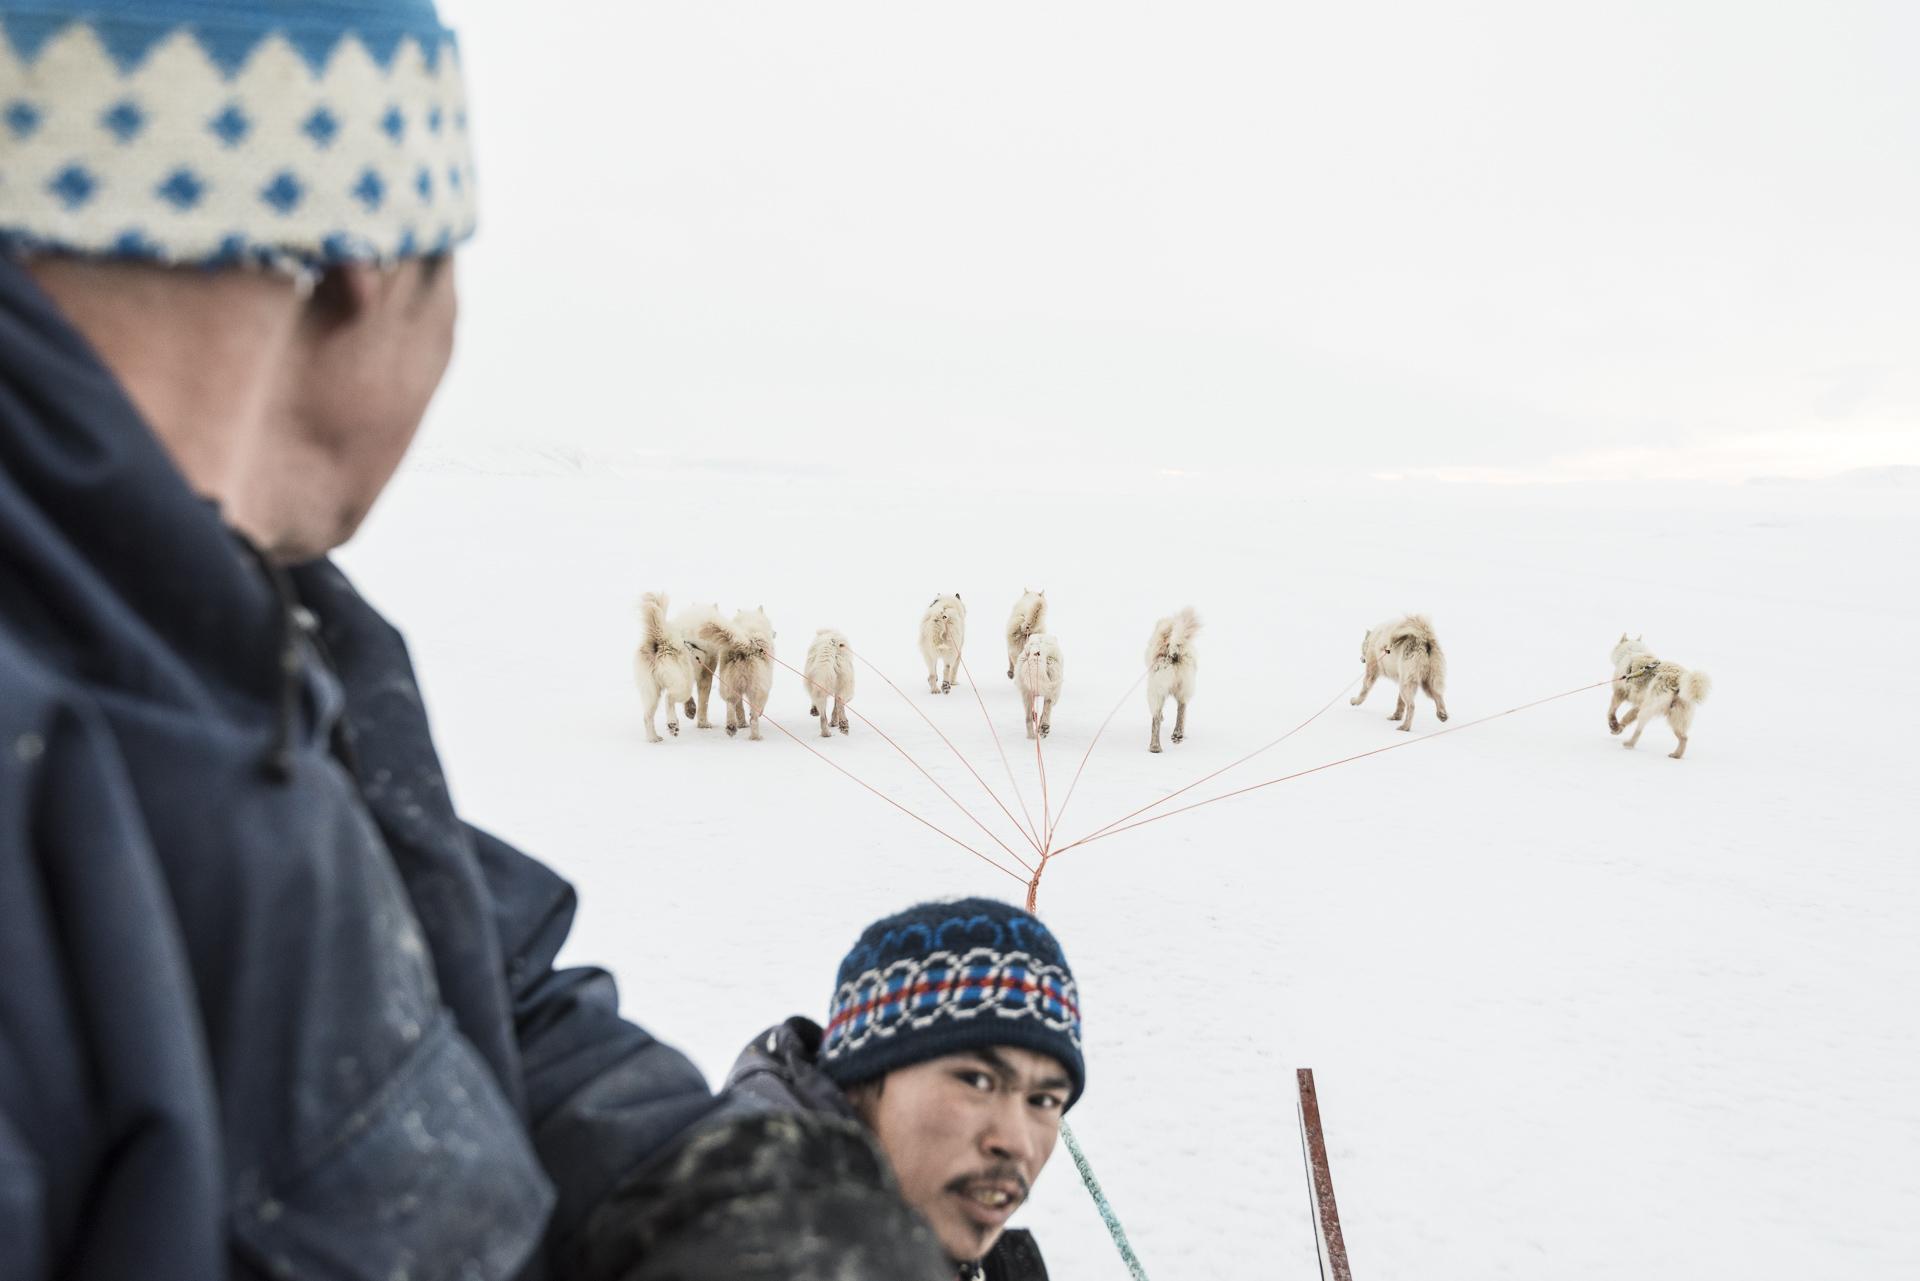 4.Defibaugh_Greenland_Uummannaq_a_115.jpg